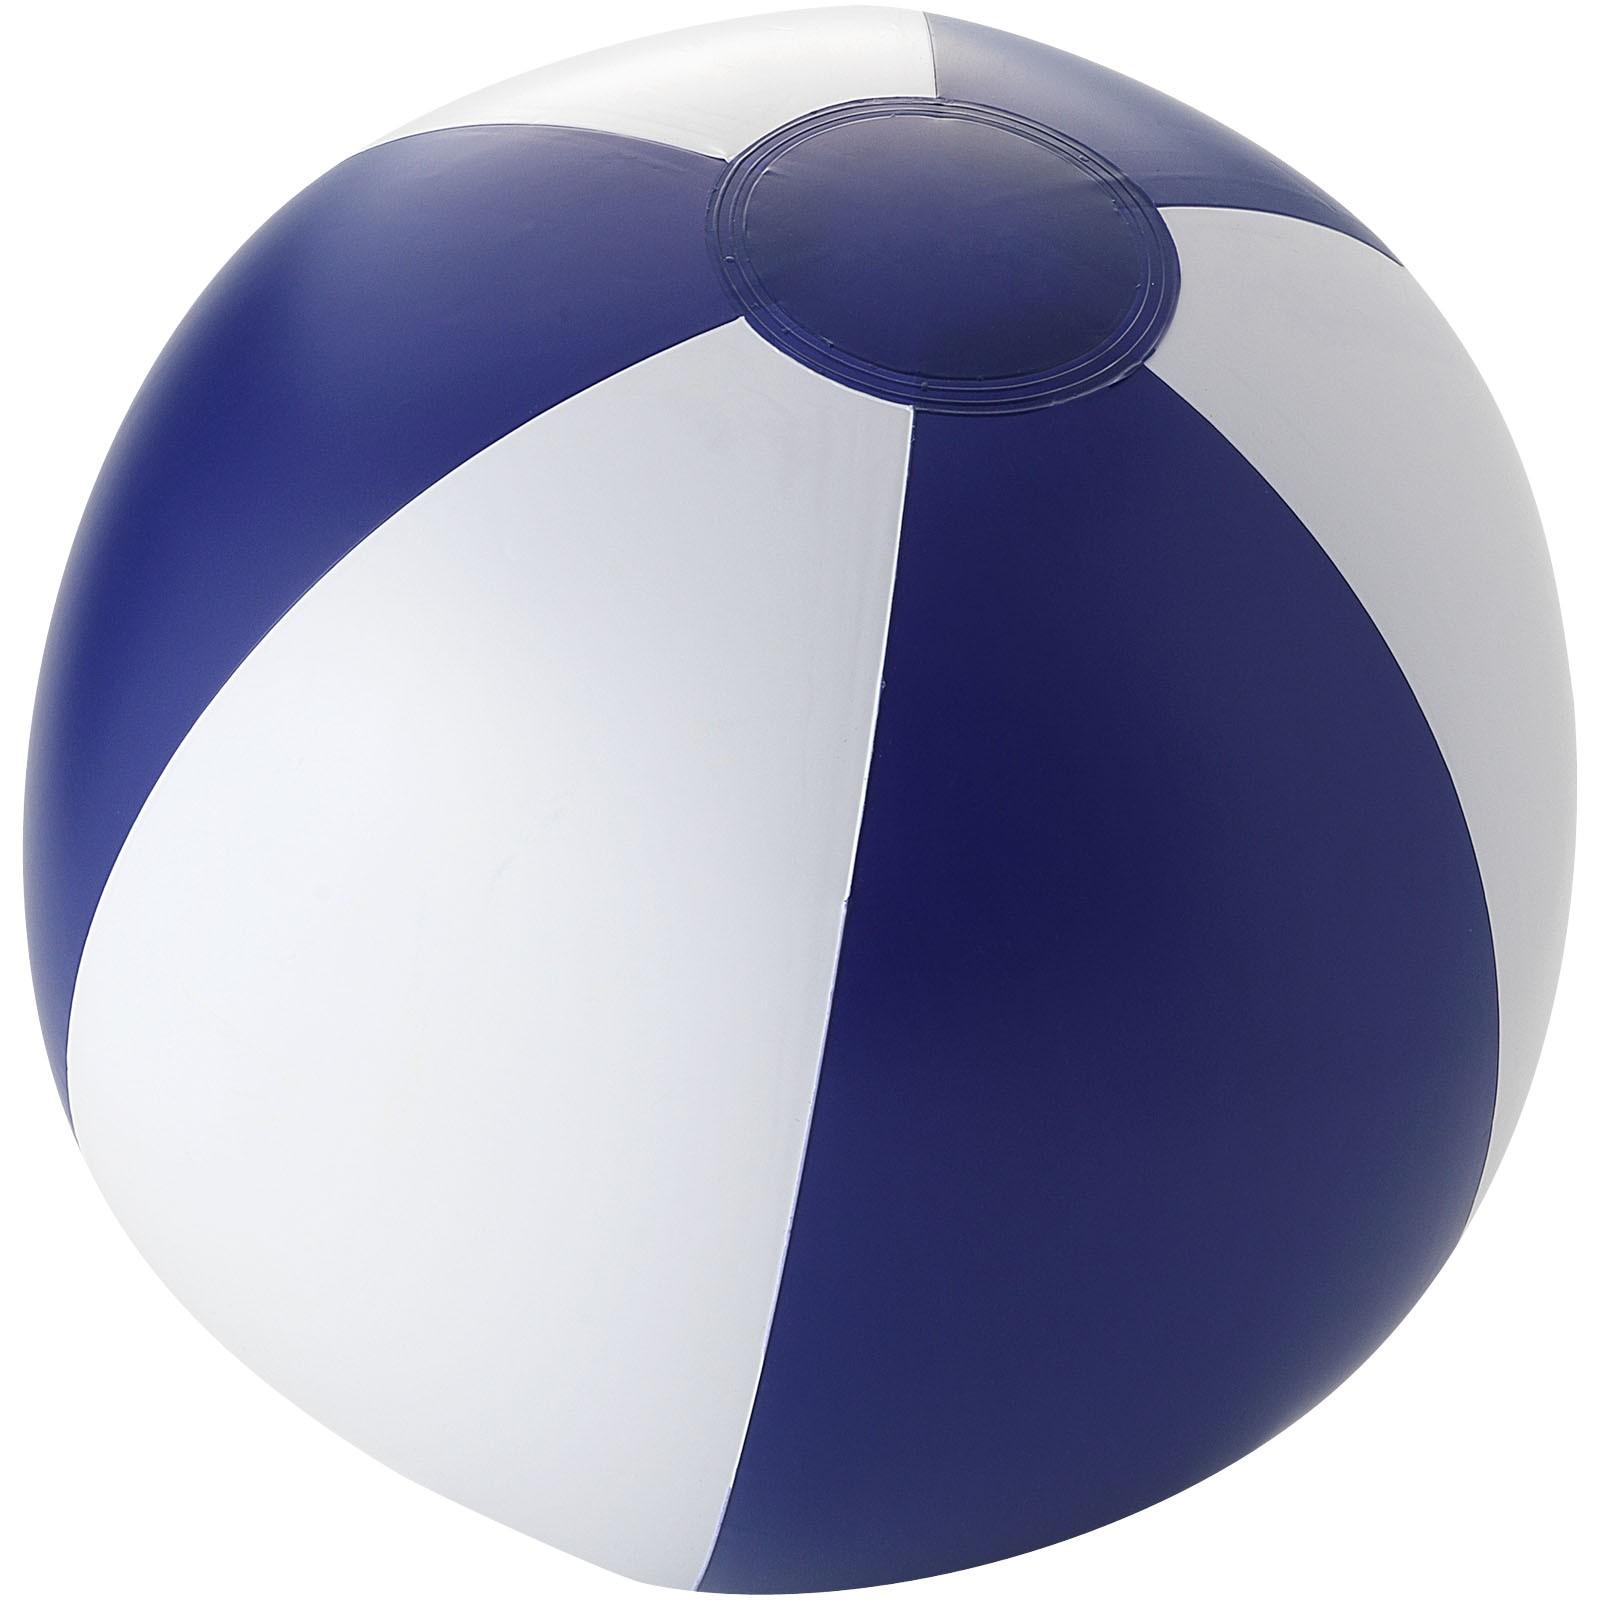 Palma solid beach ball - Navy / White